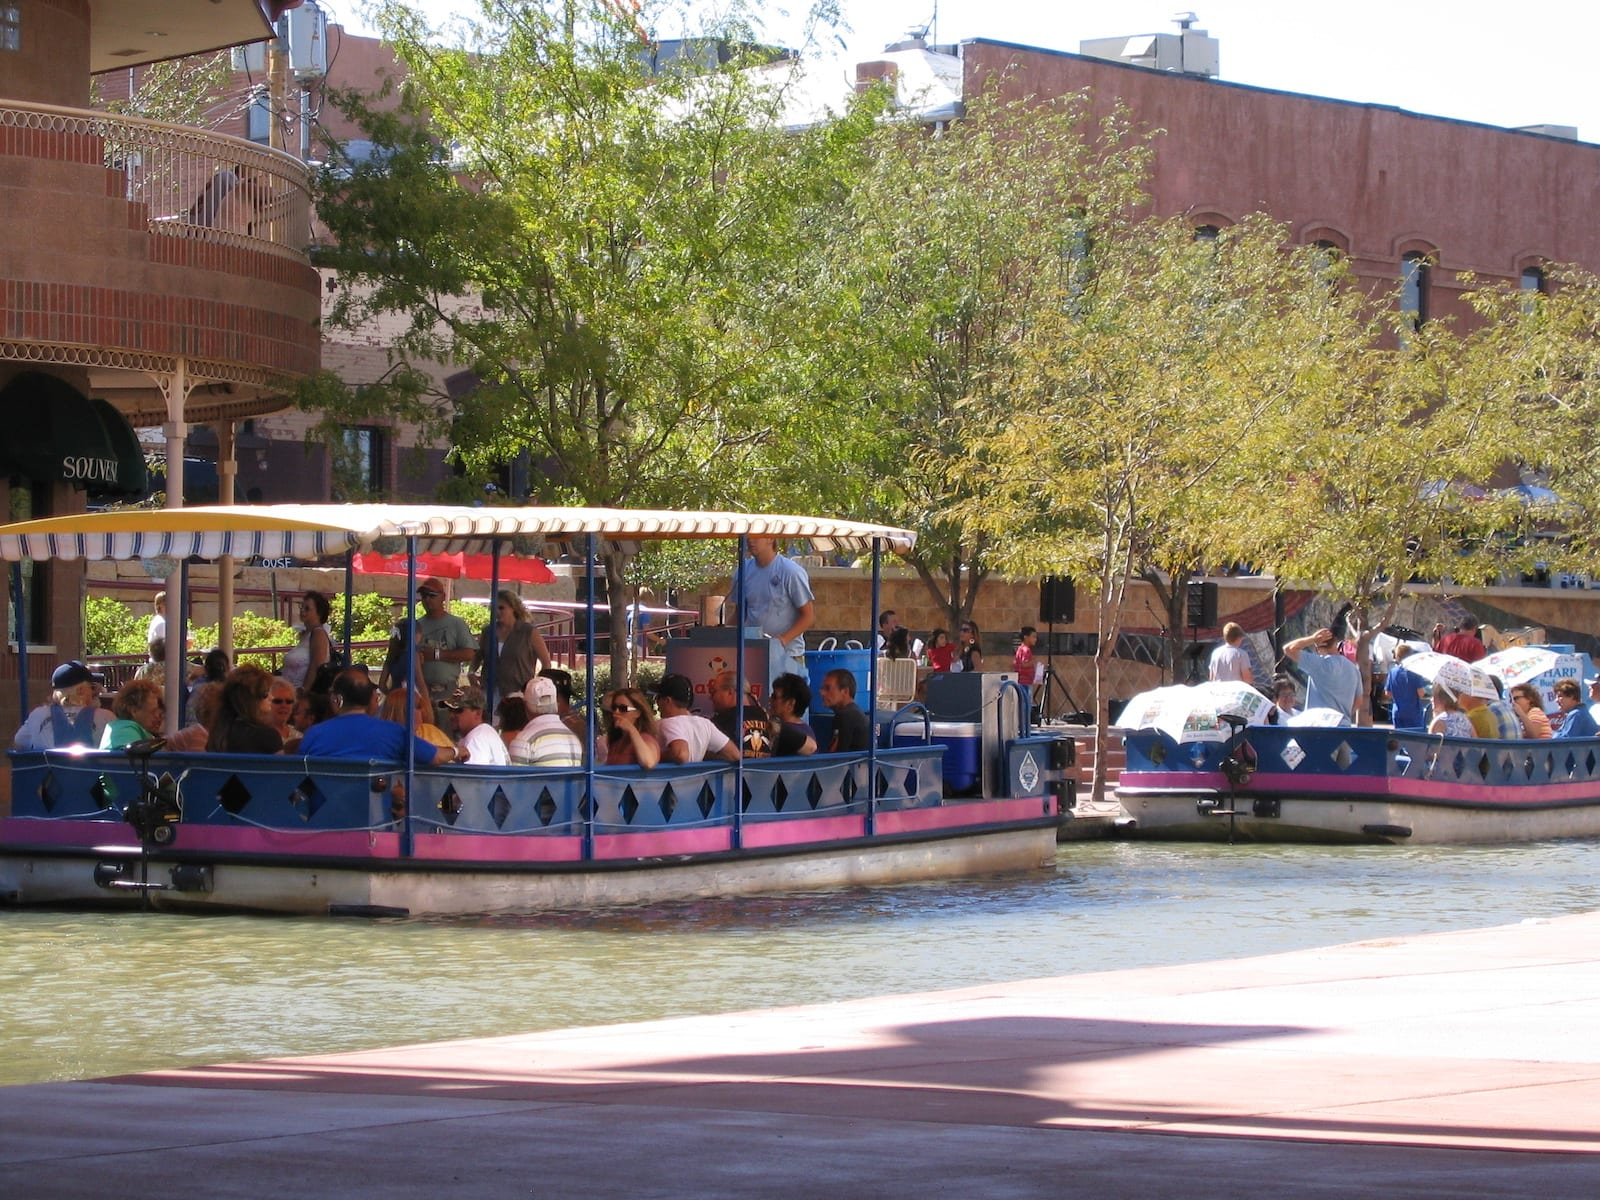 Boats on Pueblo Riverwalk, CO